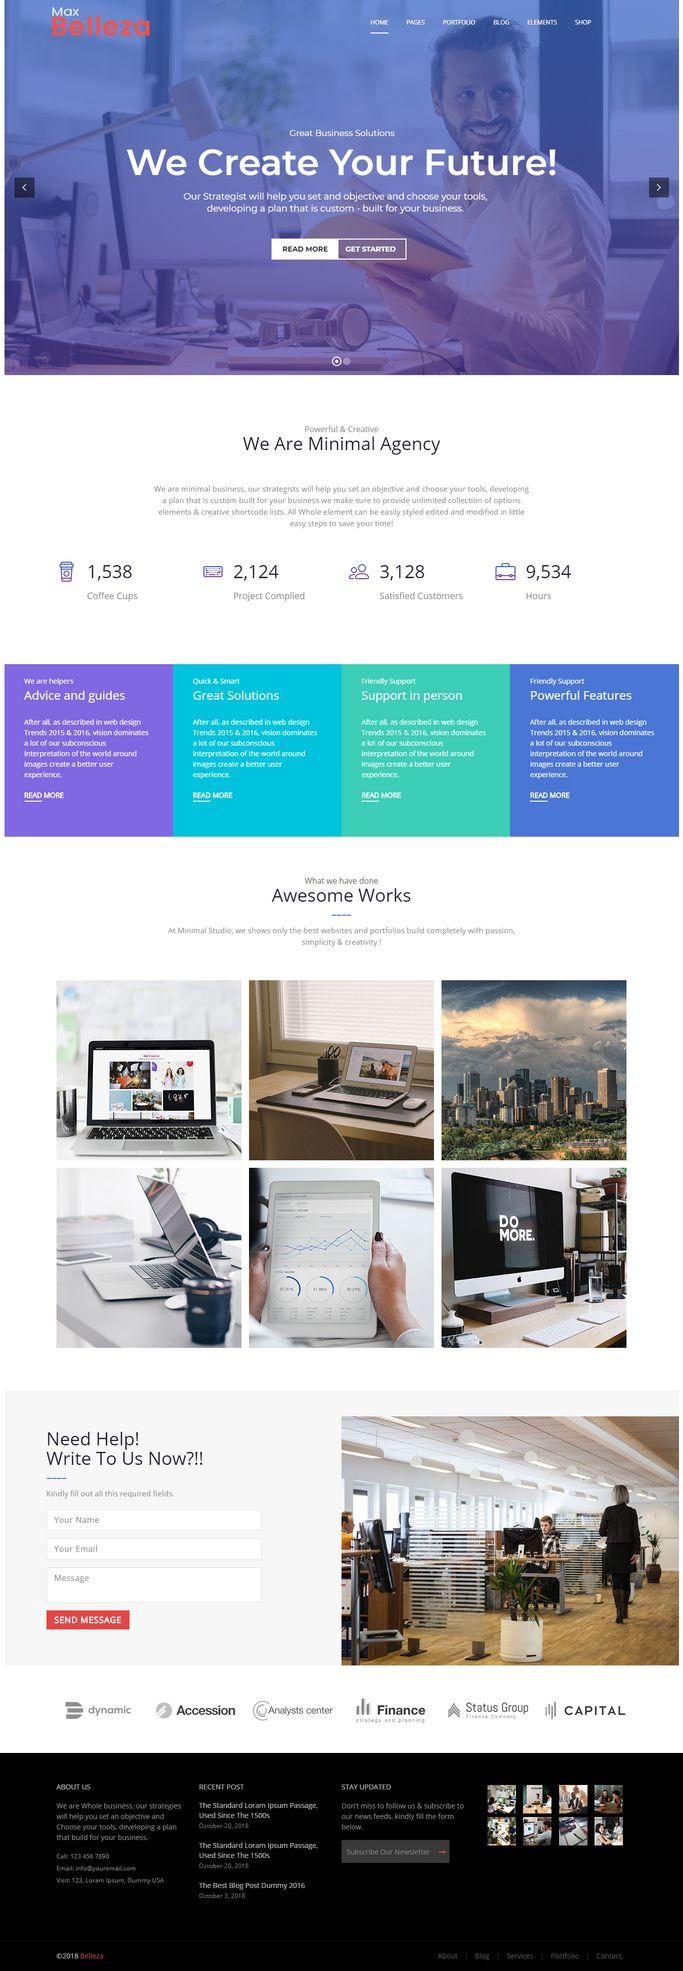 screencapture-wpthemes-multipurposethemes-belleza-marketing-2018-10-26-15_58_20